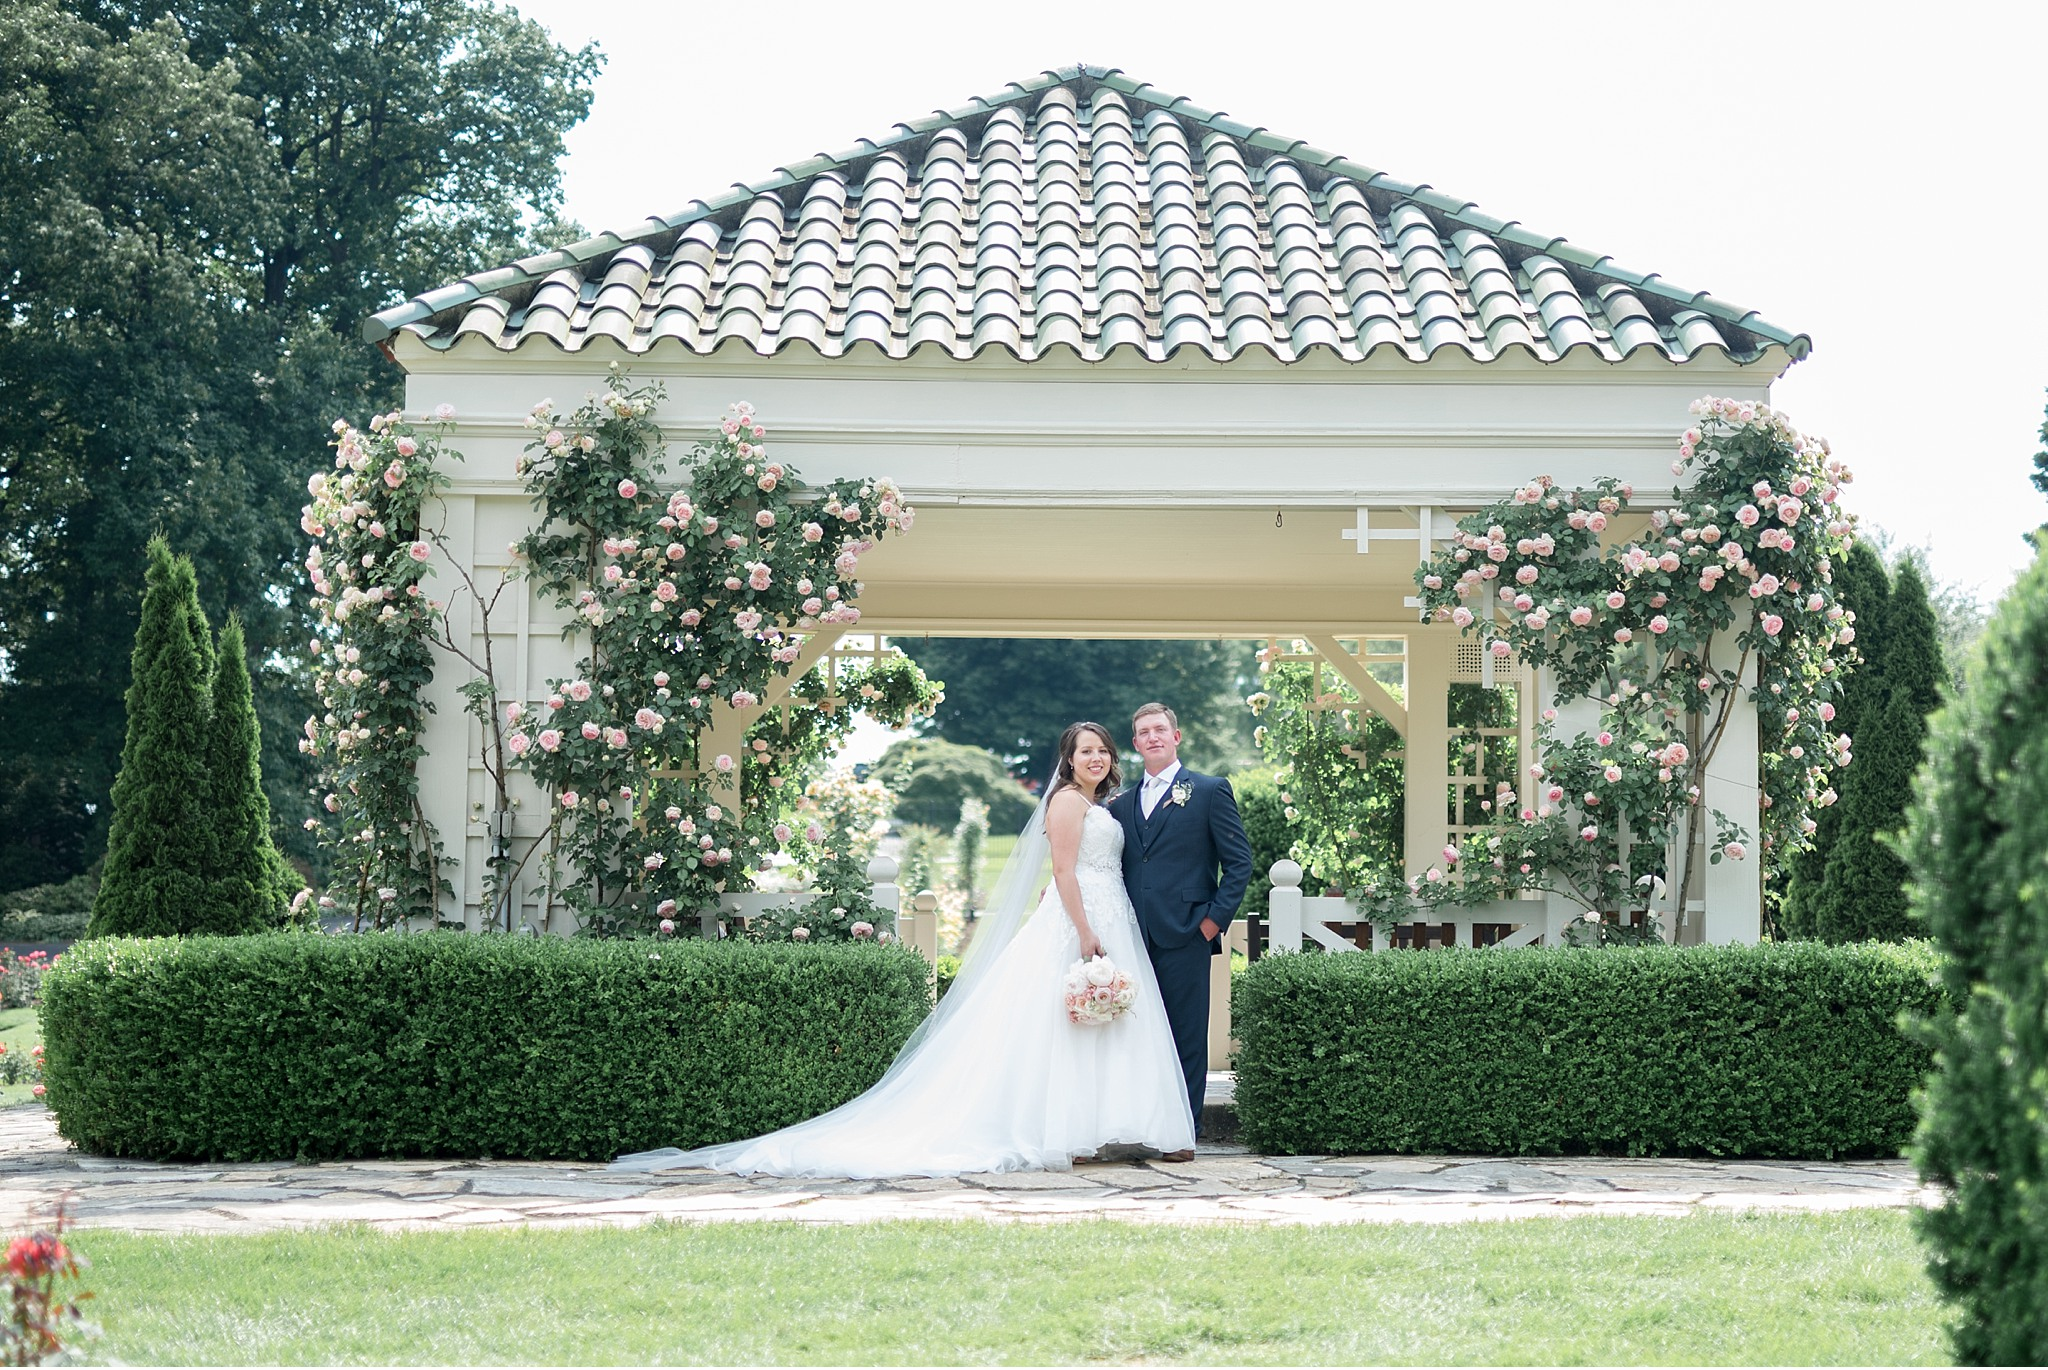 Hershey Gardens Hershey Country Club Summer beautiful wedding photography_1593.jpg